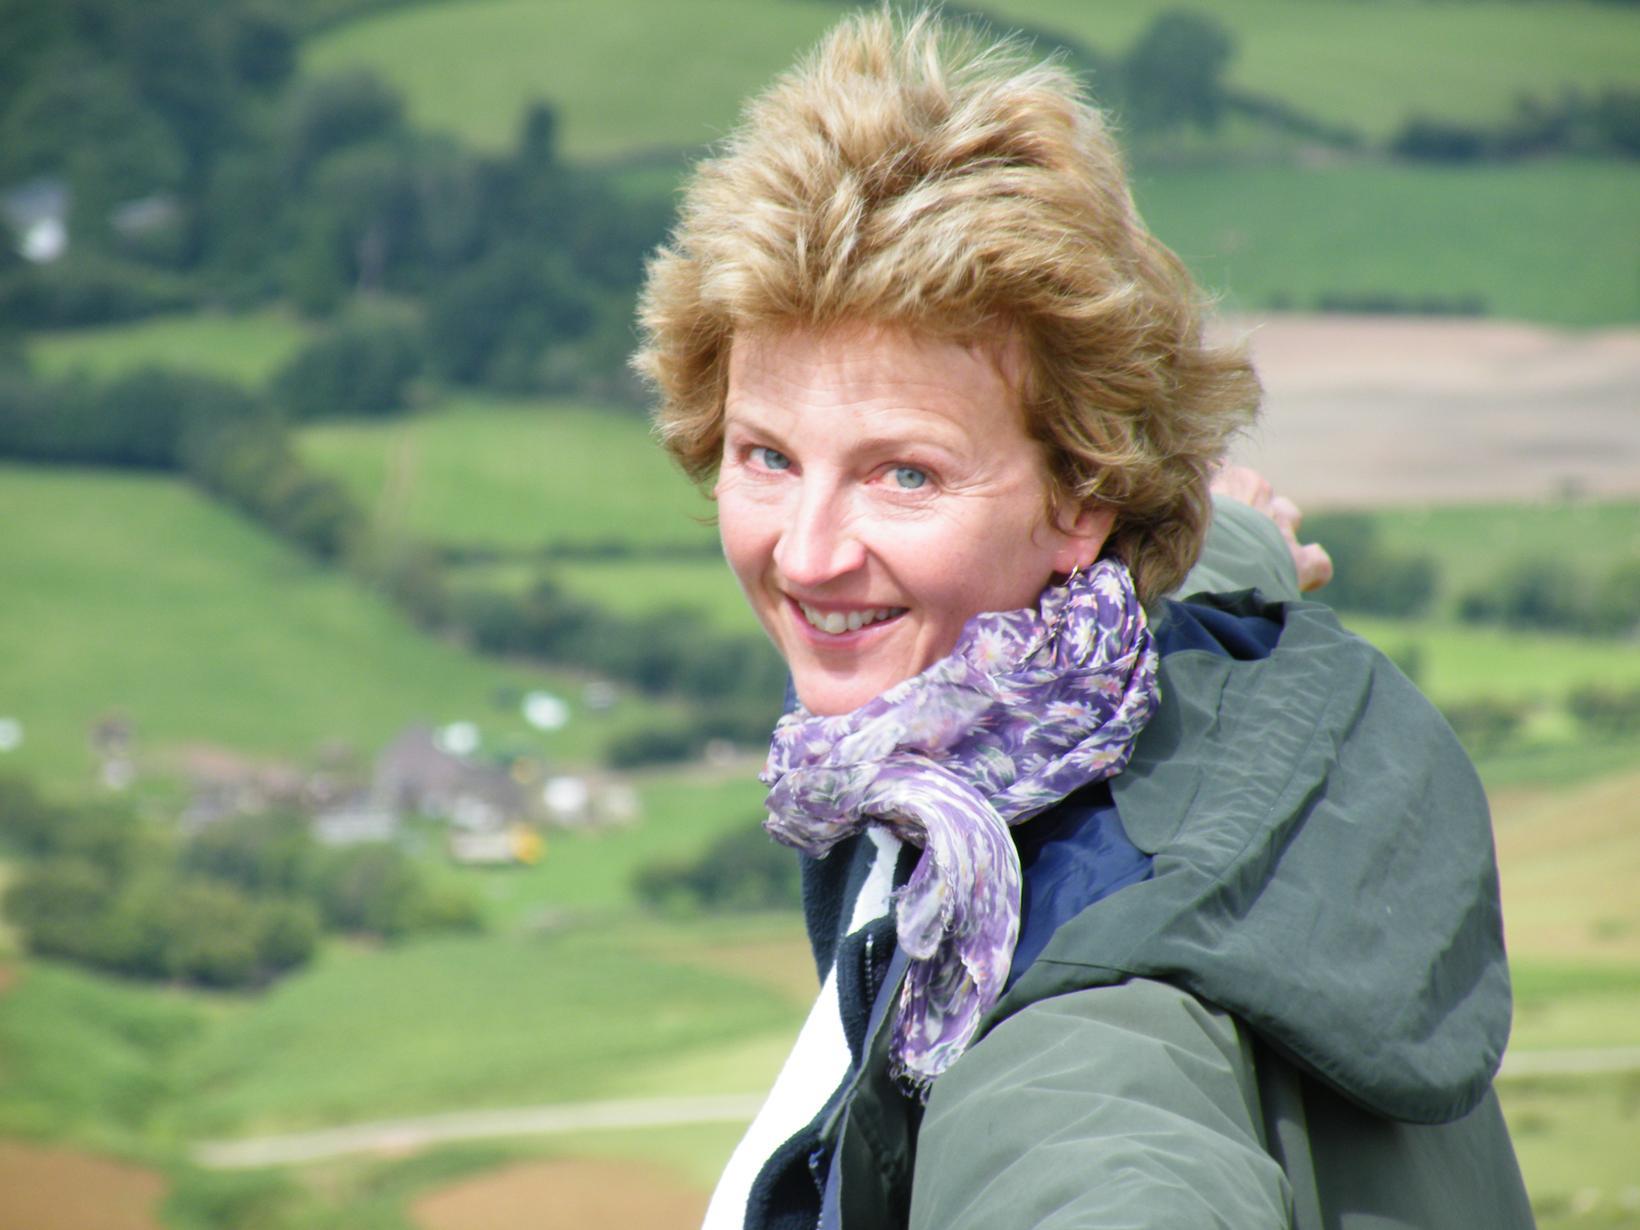 Zara from Cirencester, United Kingdom